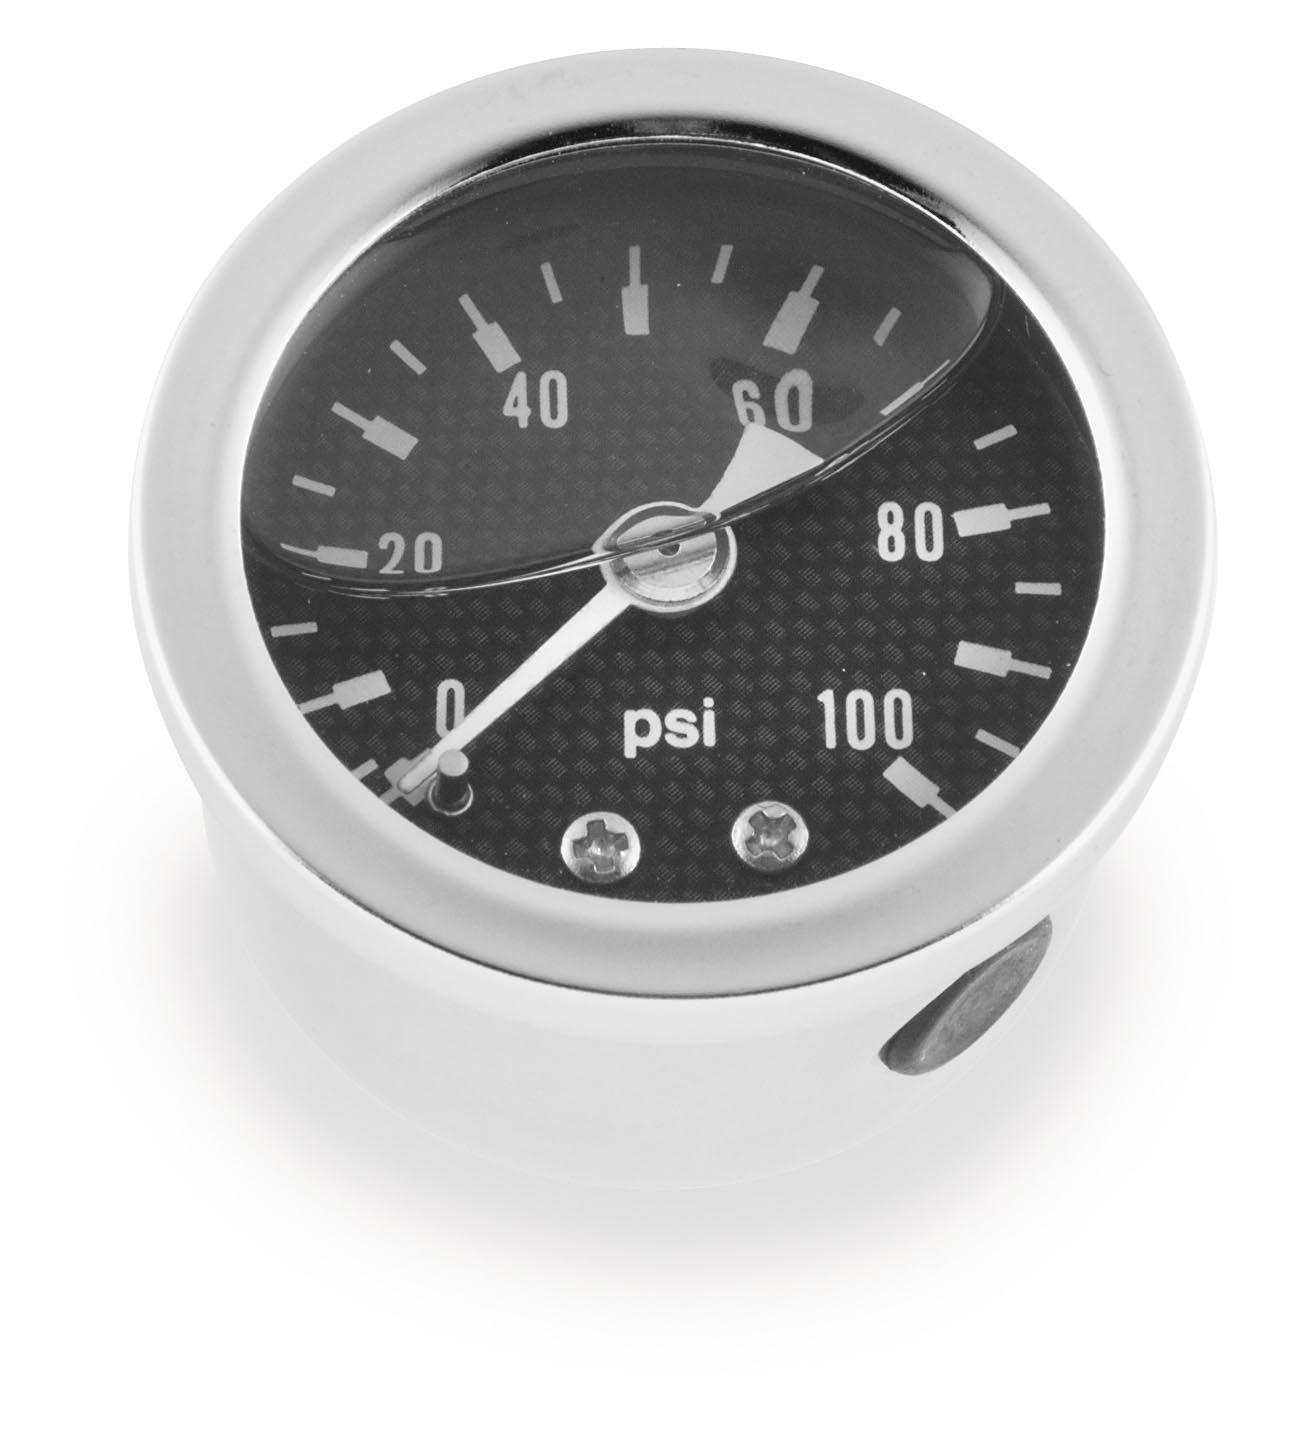 Bikers Choice Oil Pressure Gauge 0-100 PSI CRBN FBR for Harley 4333041741 Z49-6456